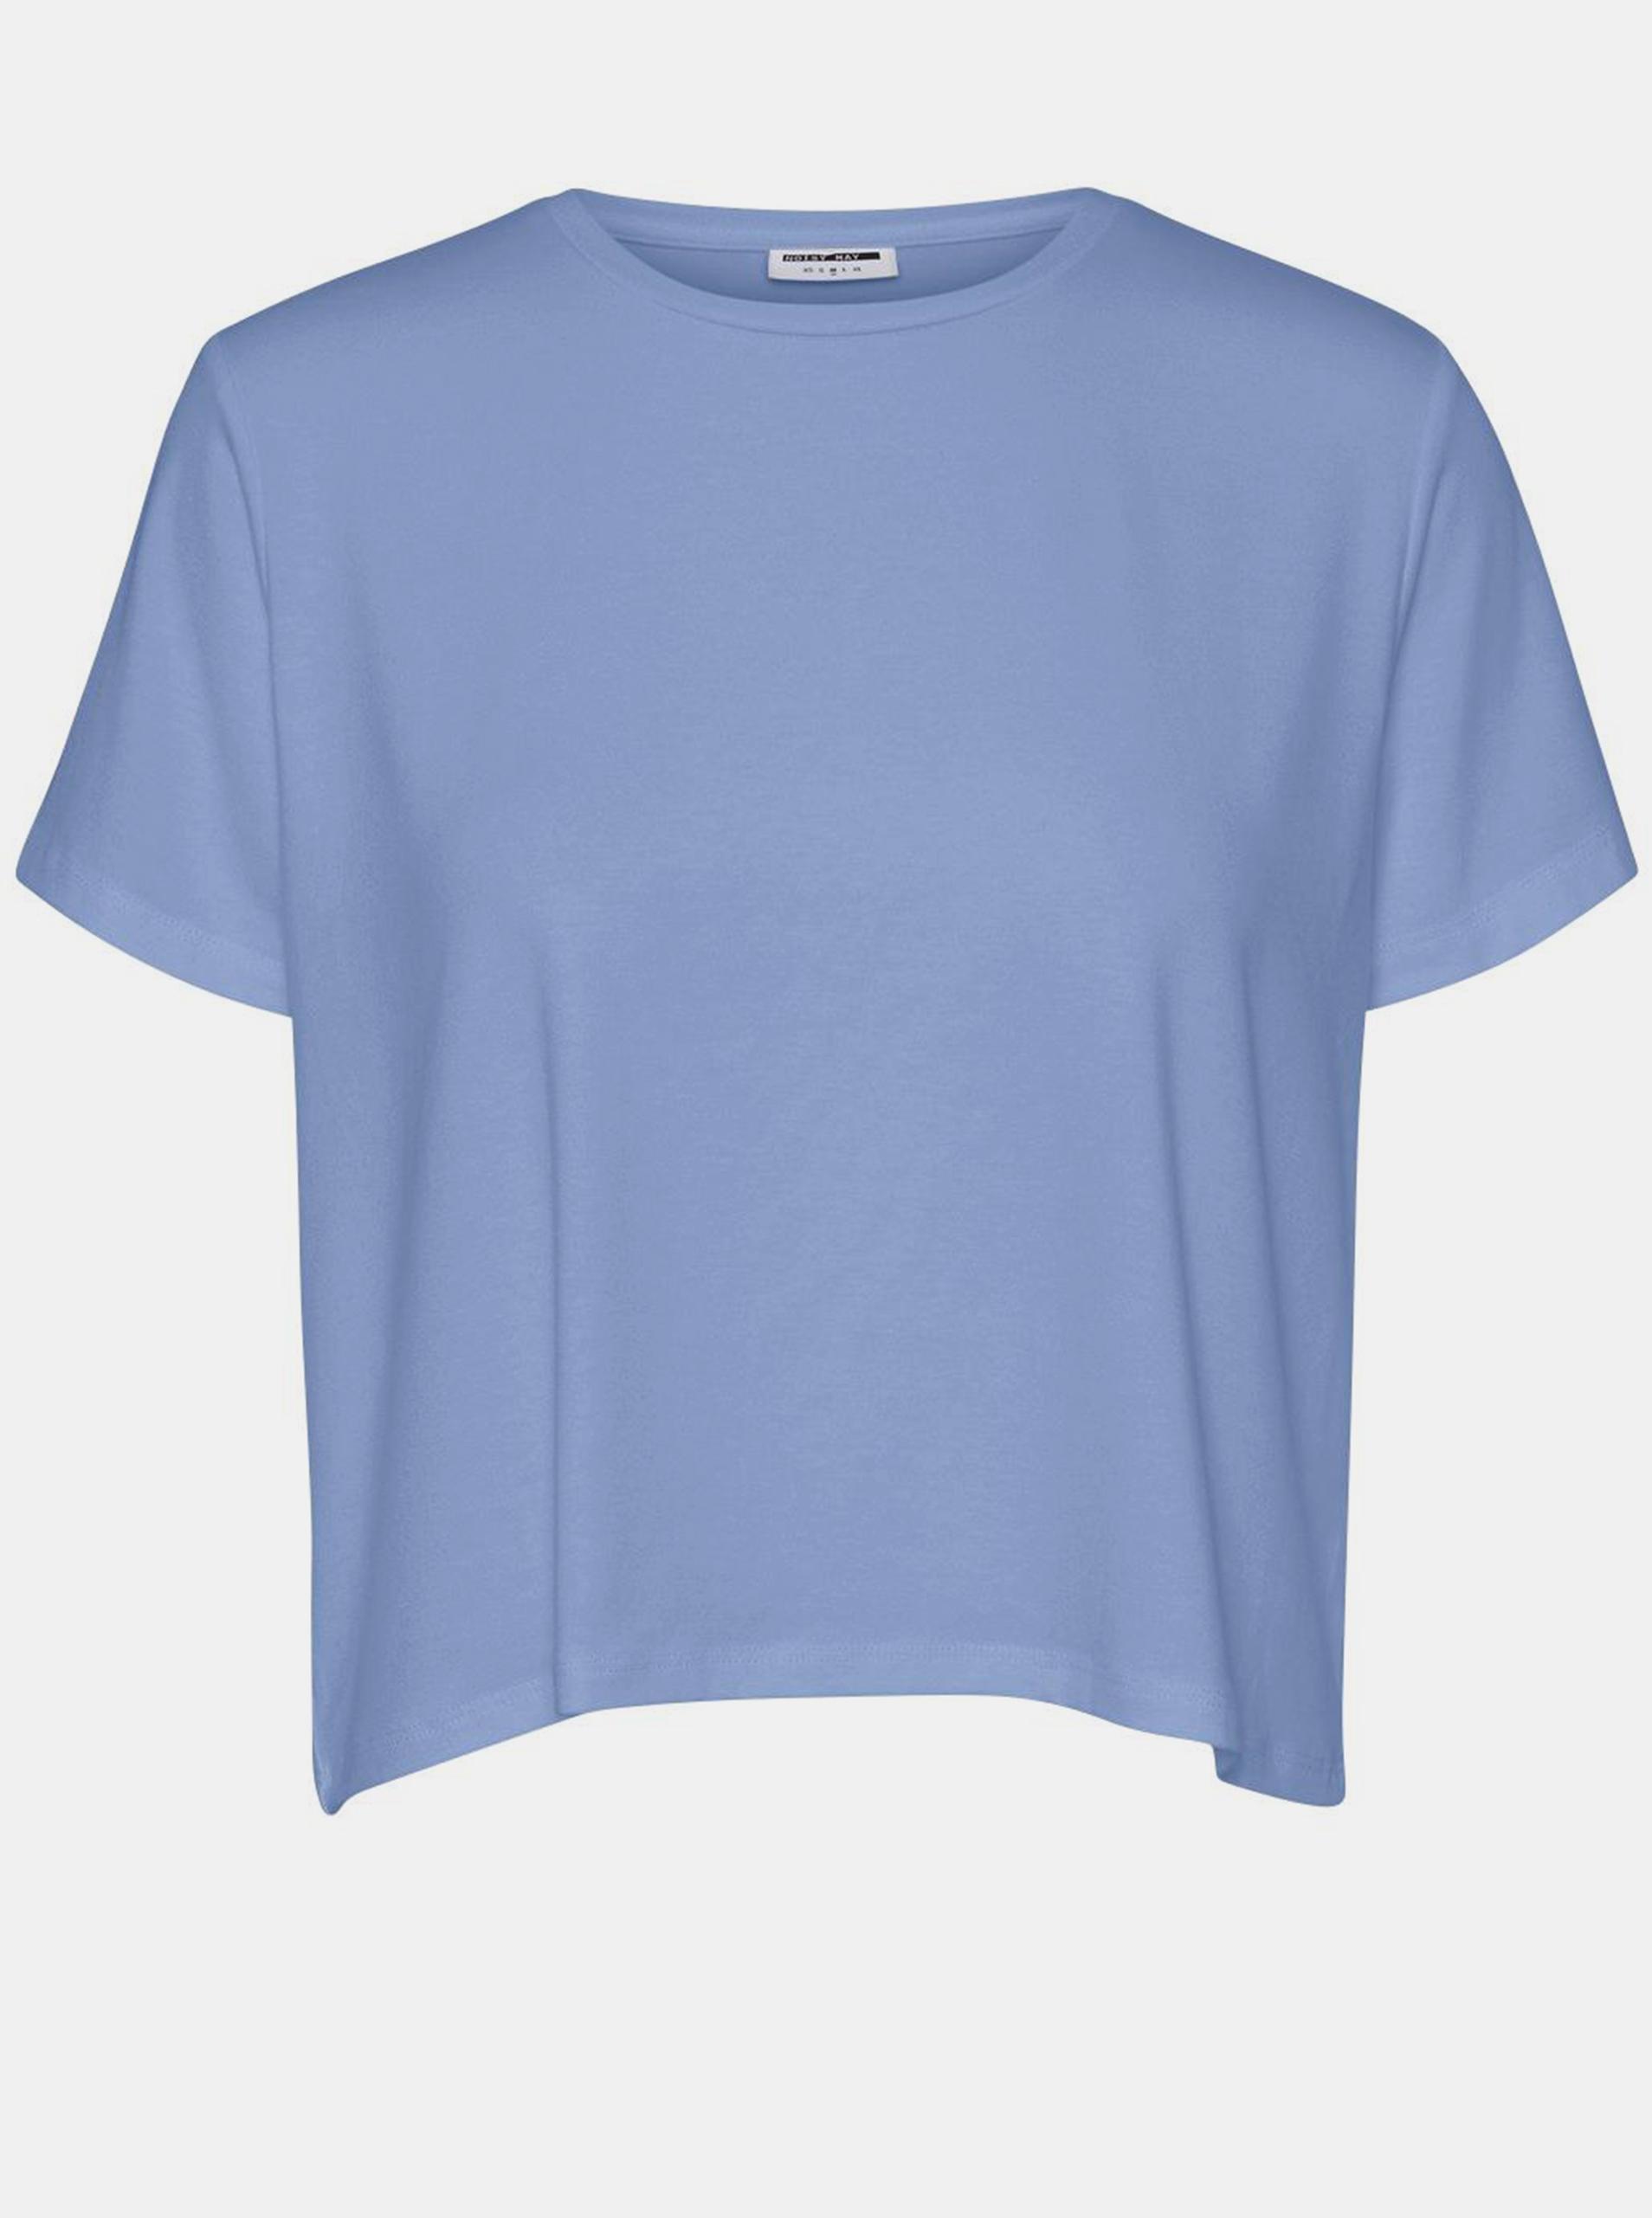 Noisy May Maglietta donna blu Elly